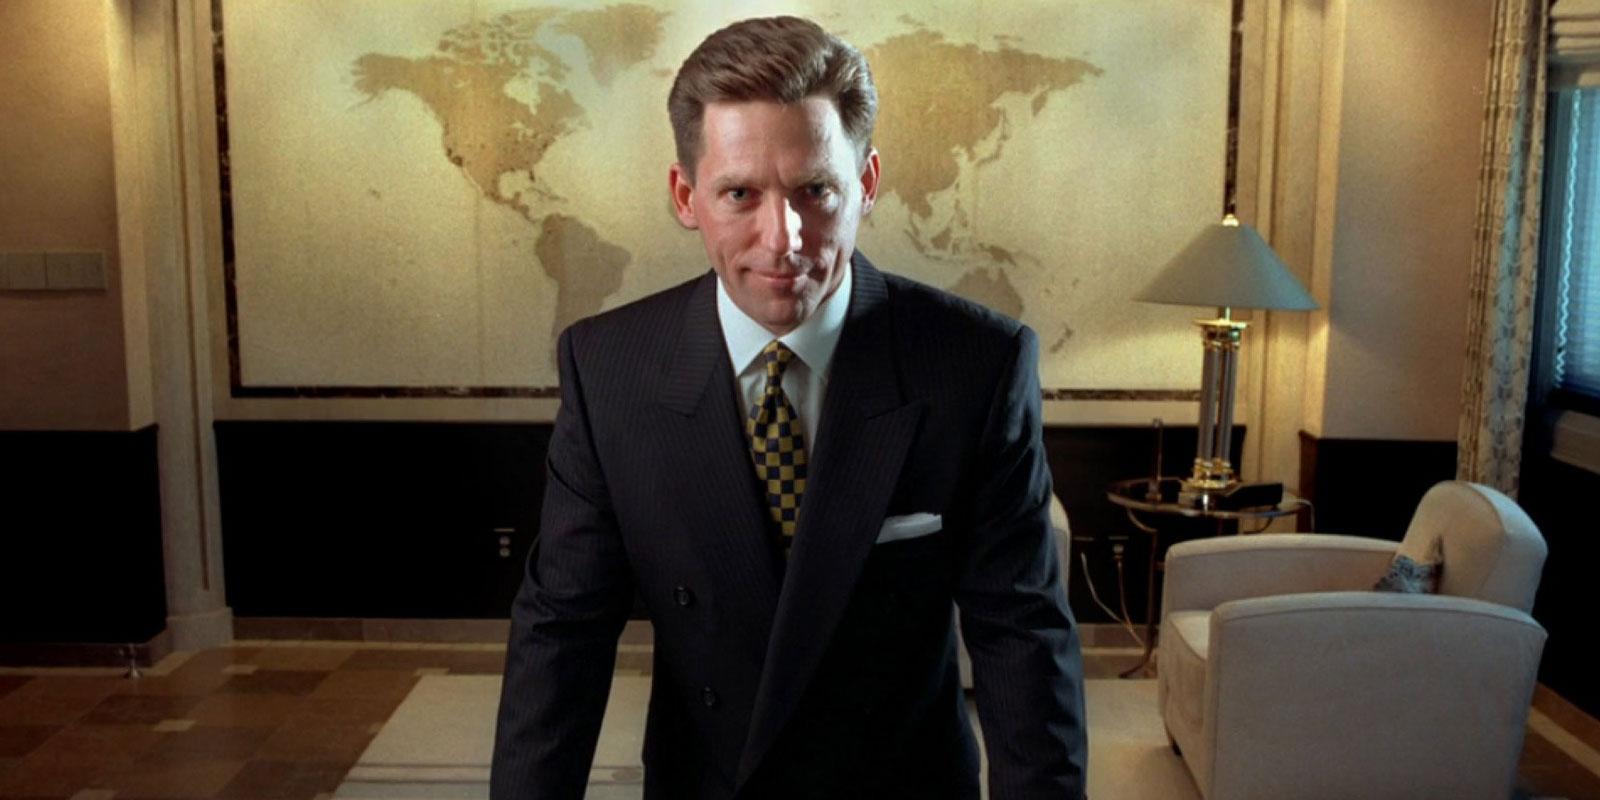 Risultati immagini per going clear scientology and the prison of belief